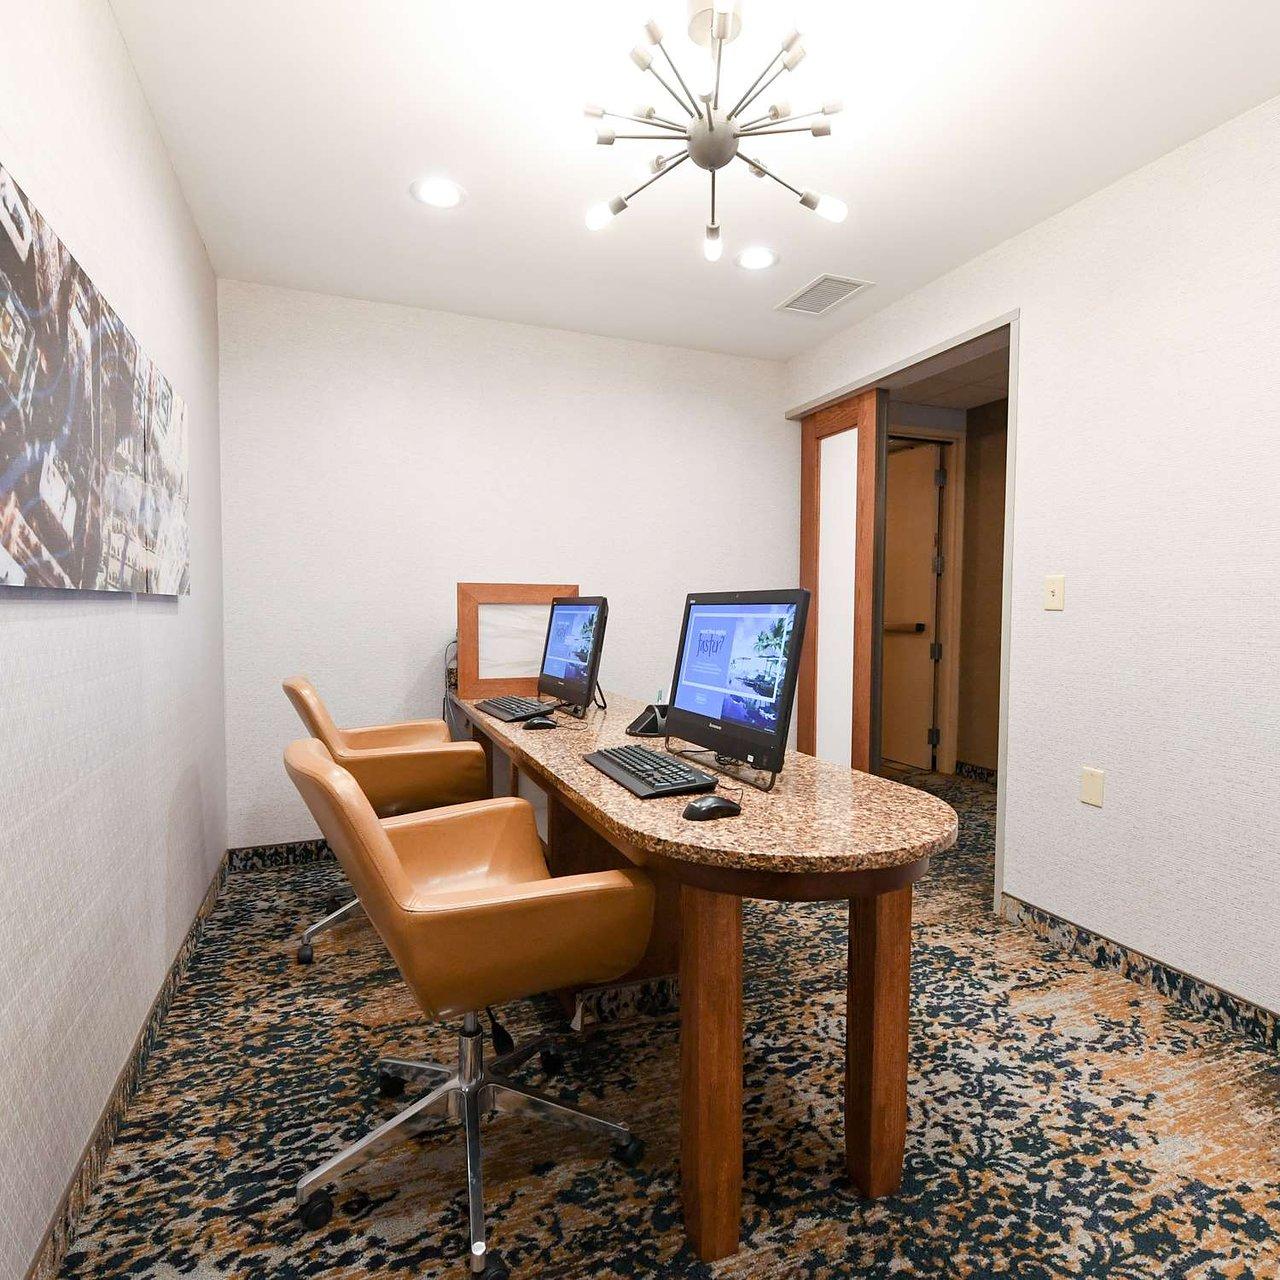 homewood suites by hilton au 212 a u 2 2 6 2018 prices rh tripadvisor com au